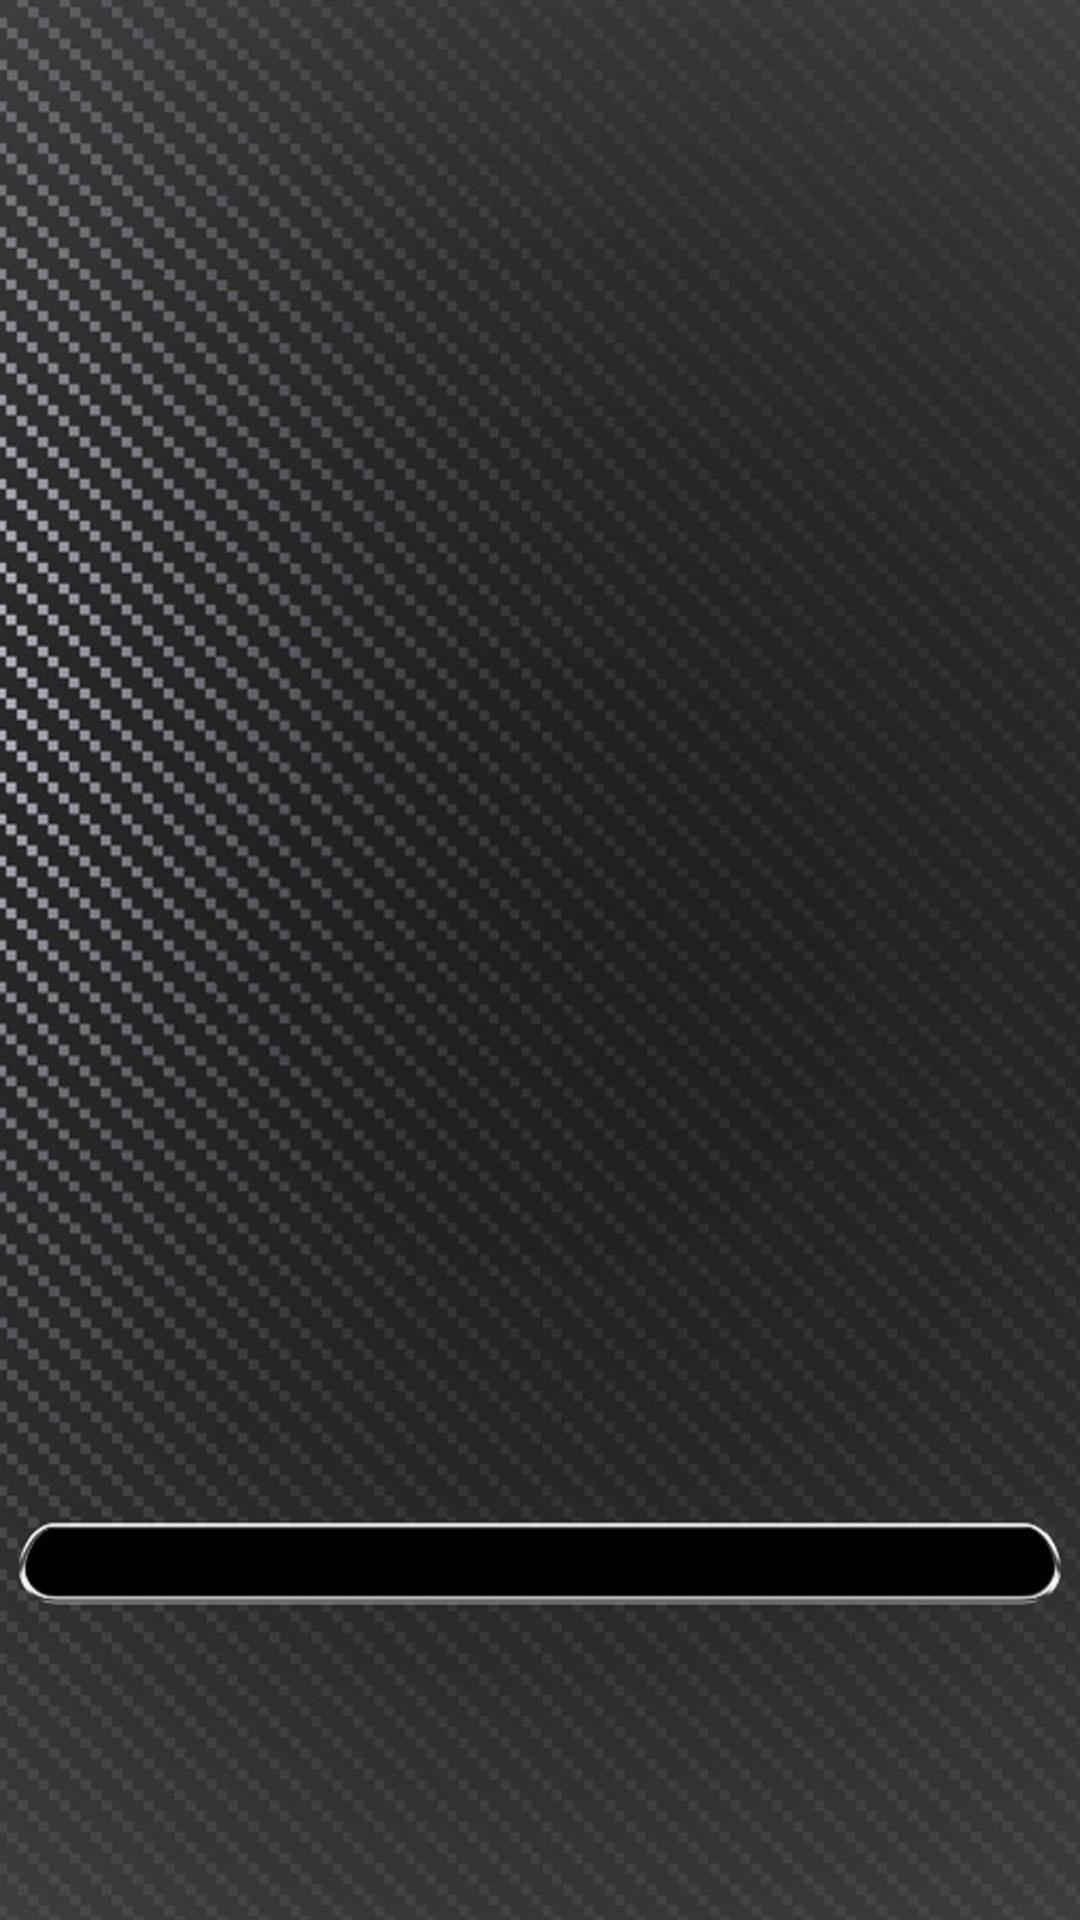 Carbon Fiber Samsung Wallpapers Samsung Galaxy S5 Galaxy S4 Galaxy 1080x1920